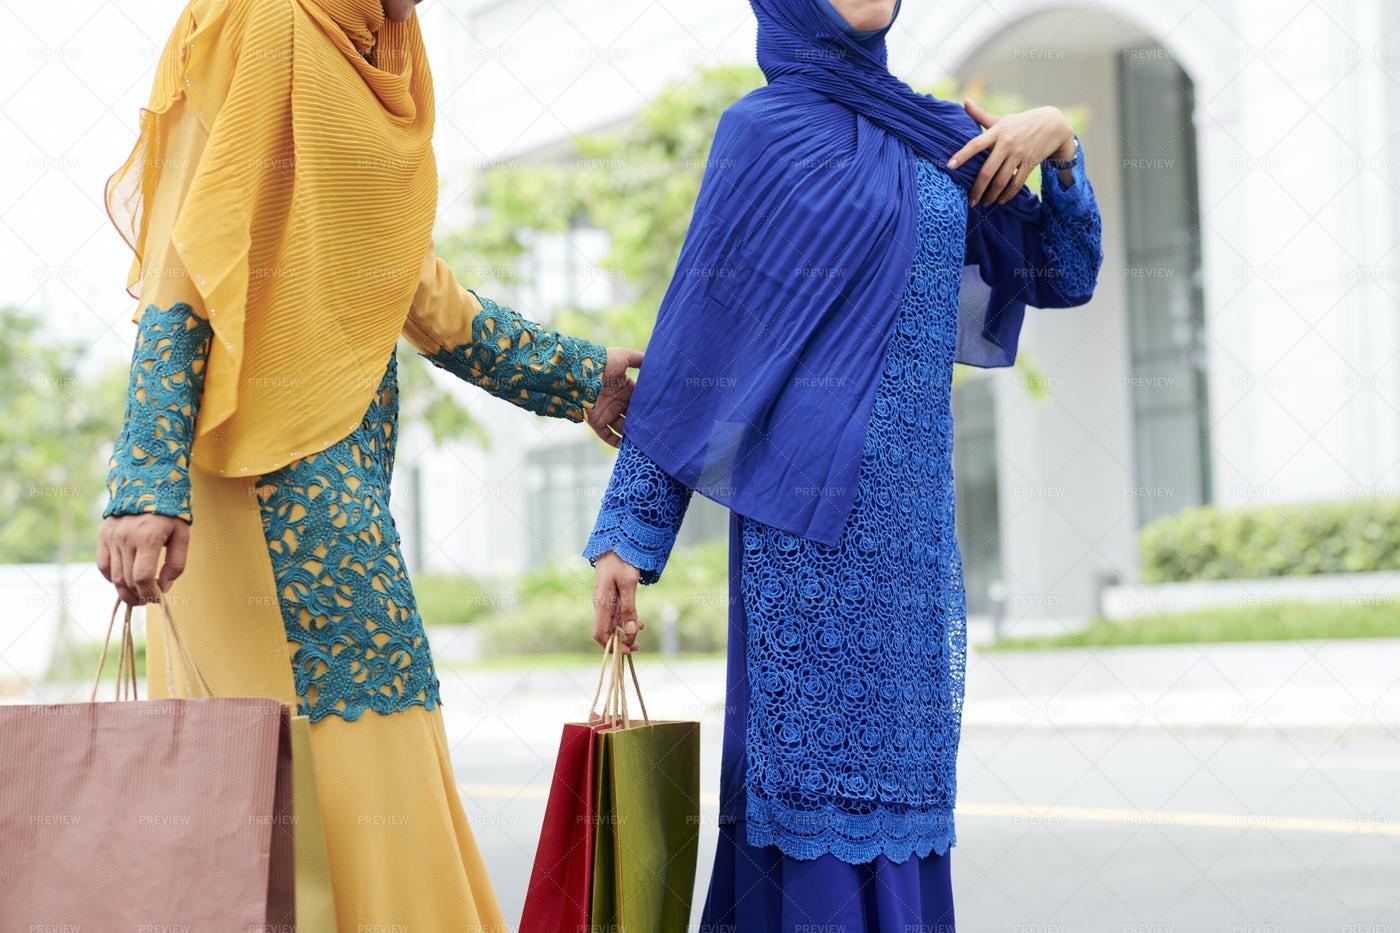 Muslim Women With Shopping Bags: Stock Photos